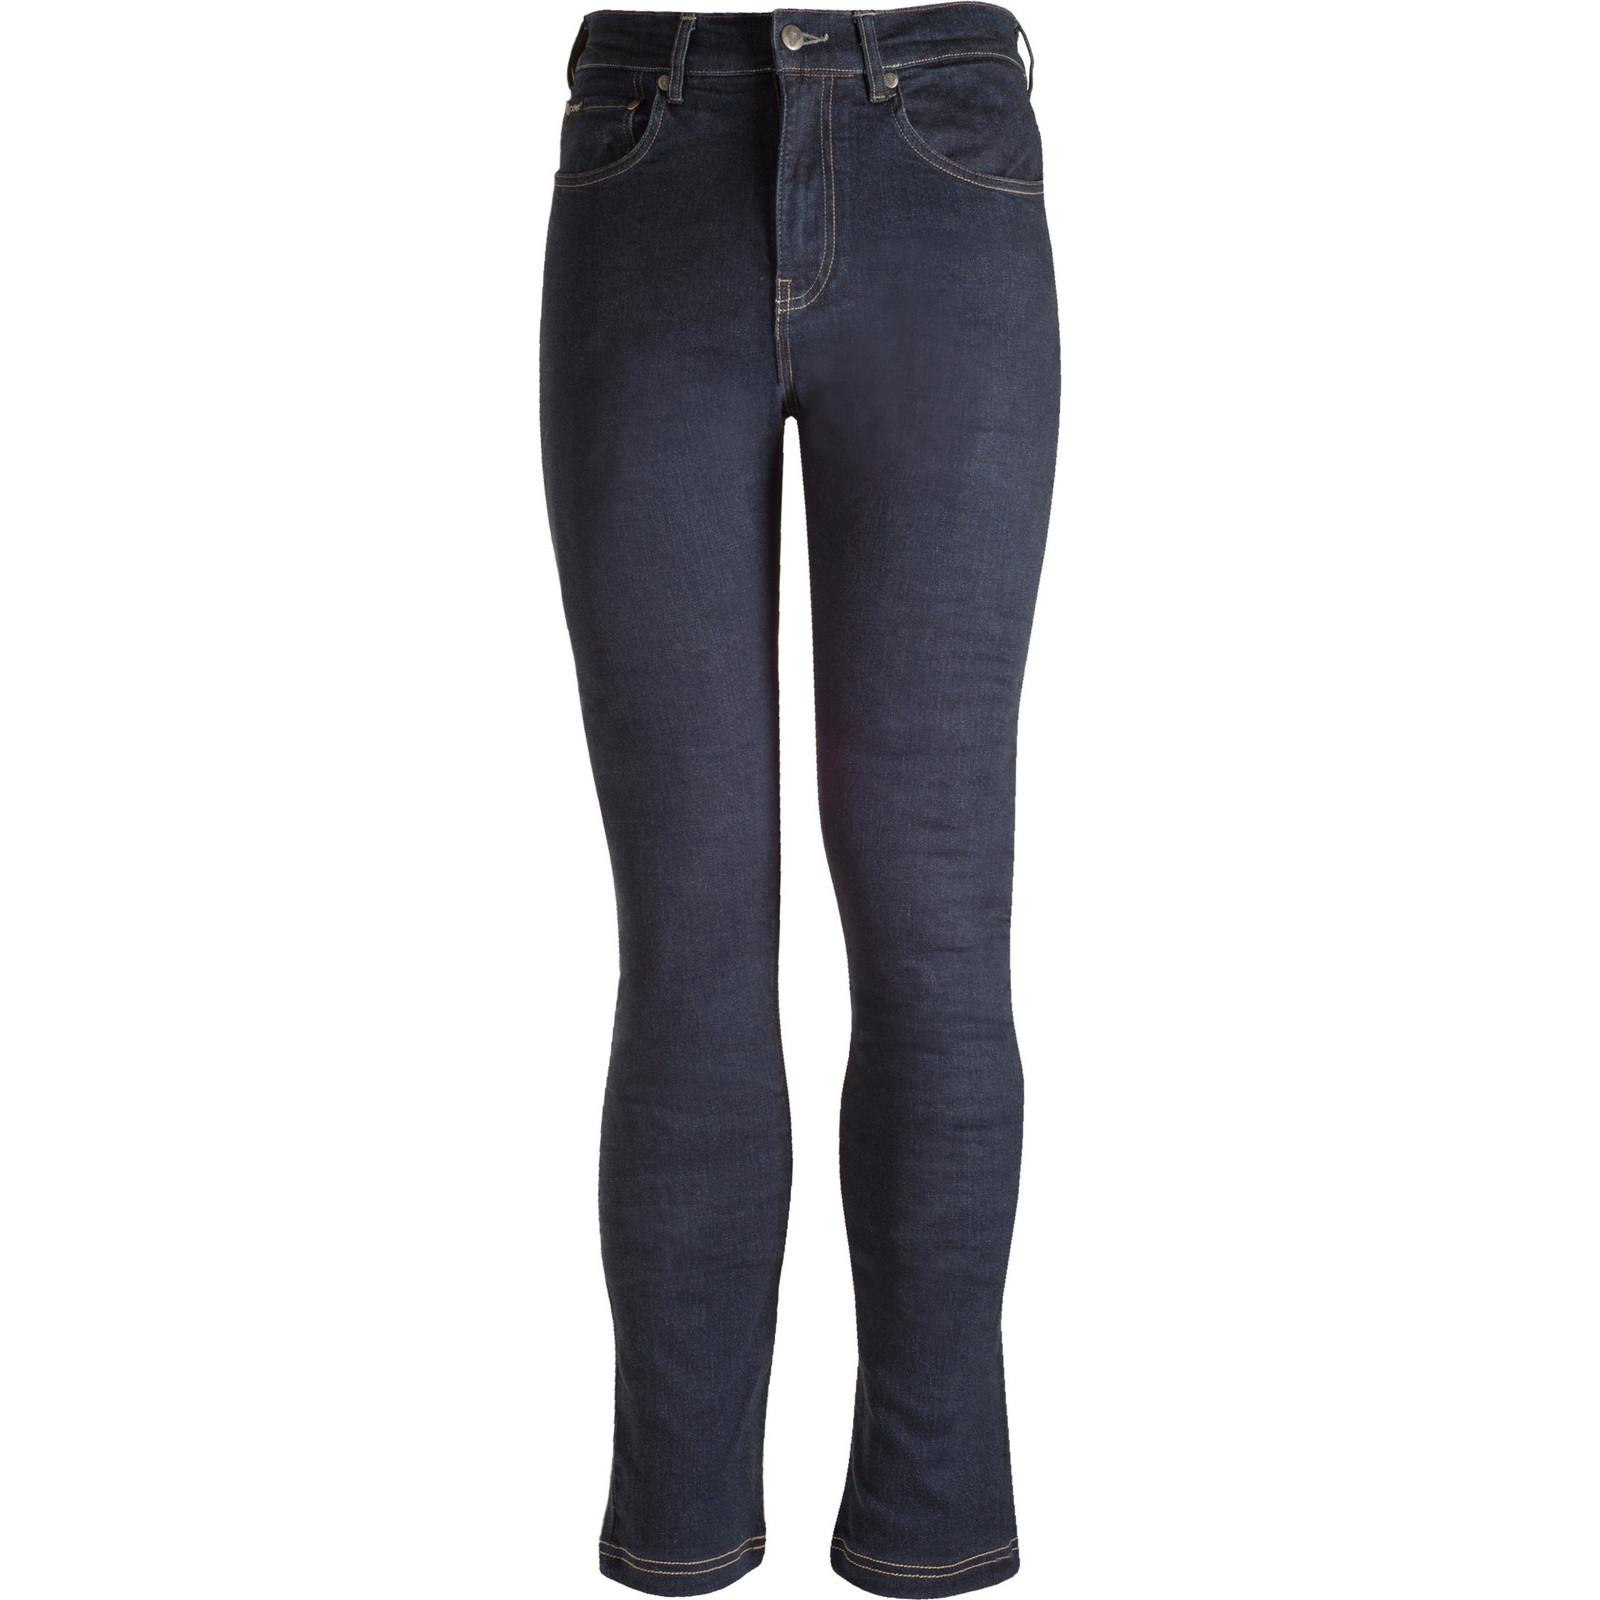 bull it sr6 italian 17 slim fit blue motorcycle jeans new arrivals. Black Bedroom Furniture Sets. Home Design Ideas